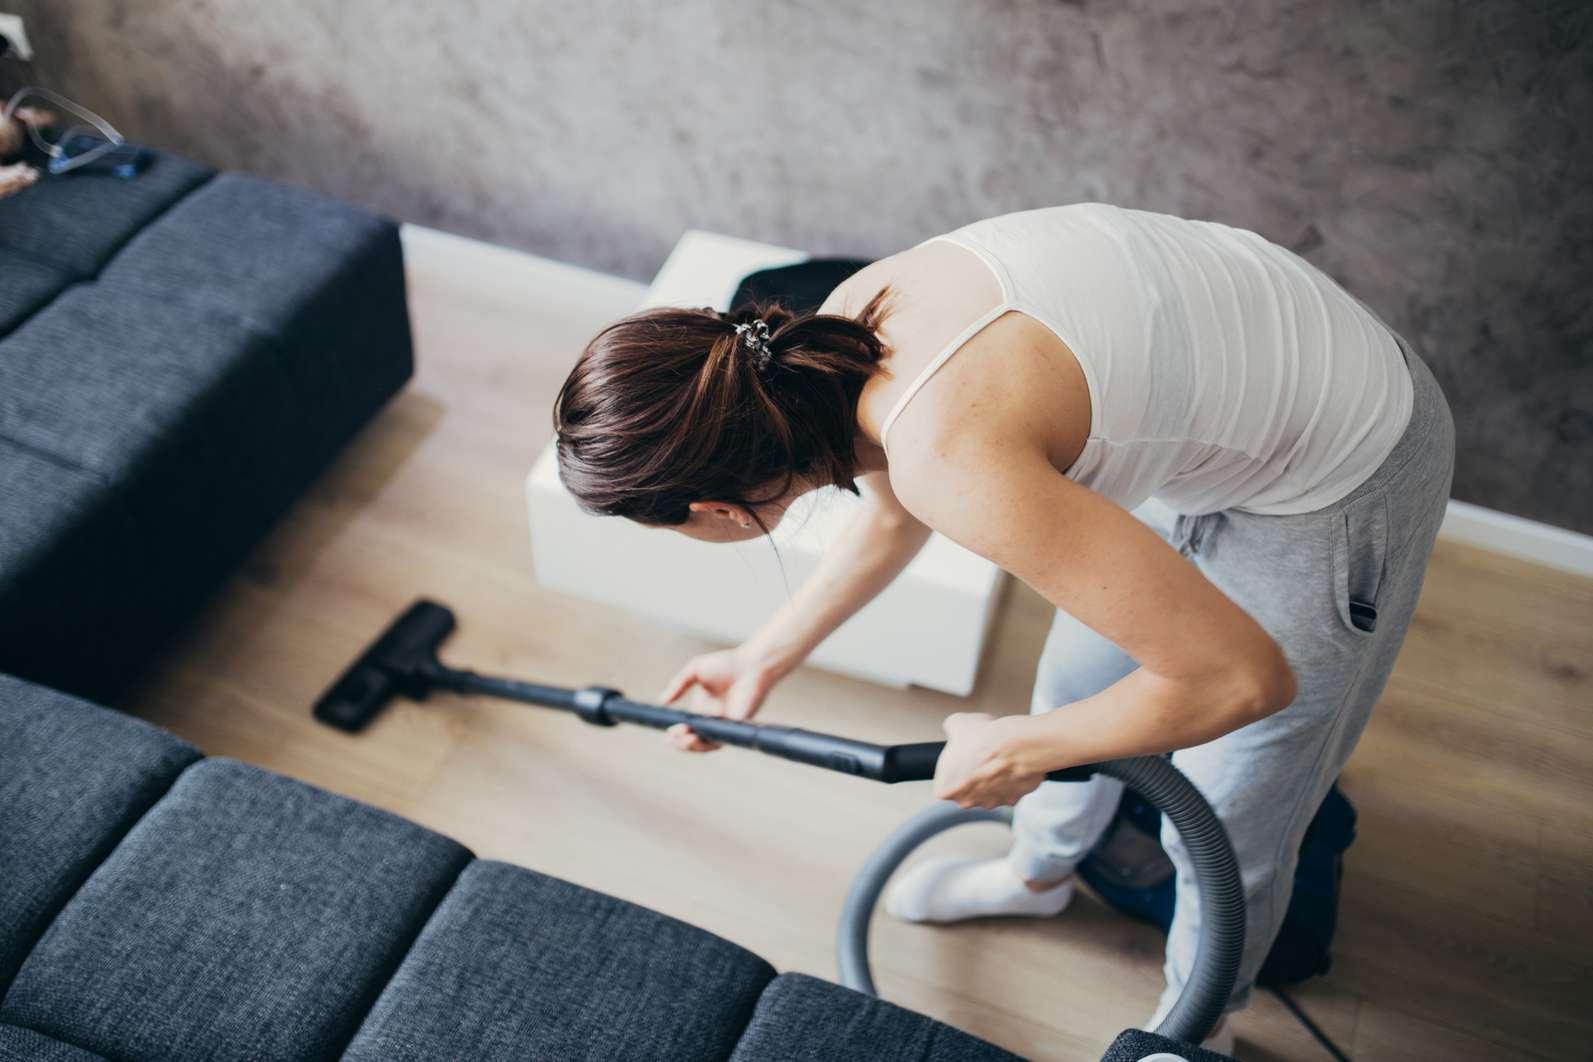 lady vacuuming floor